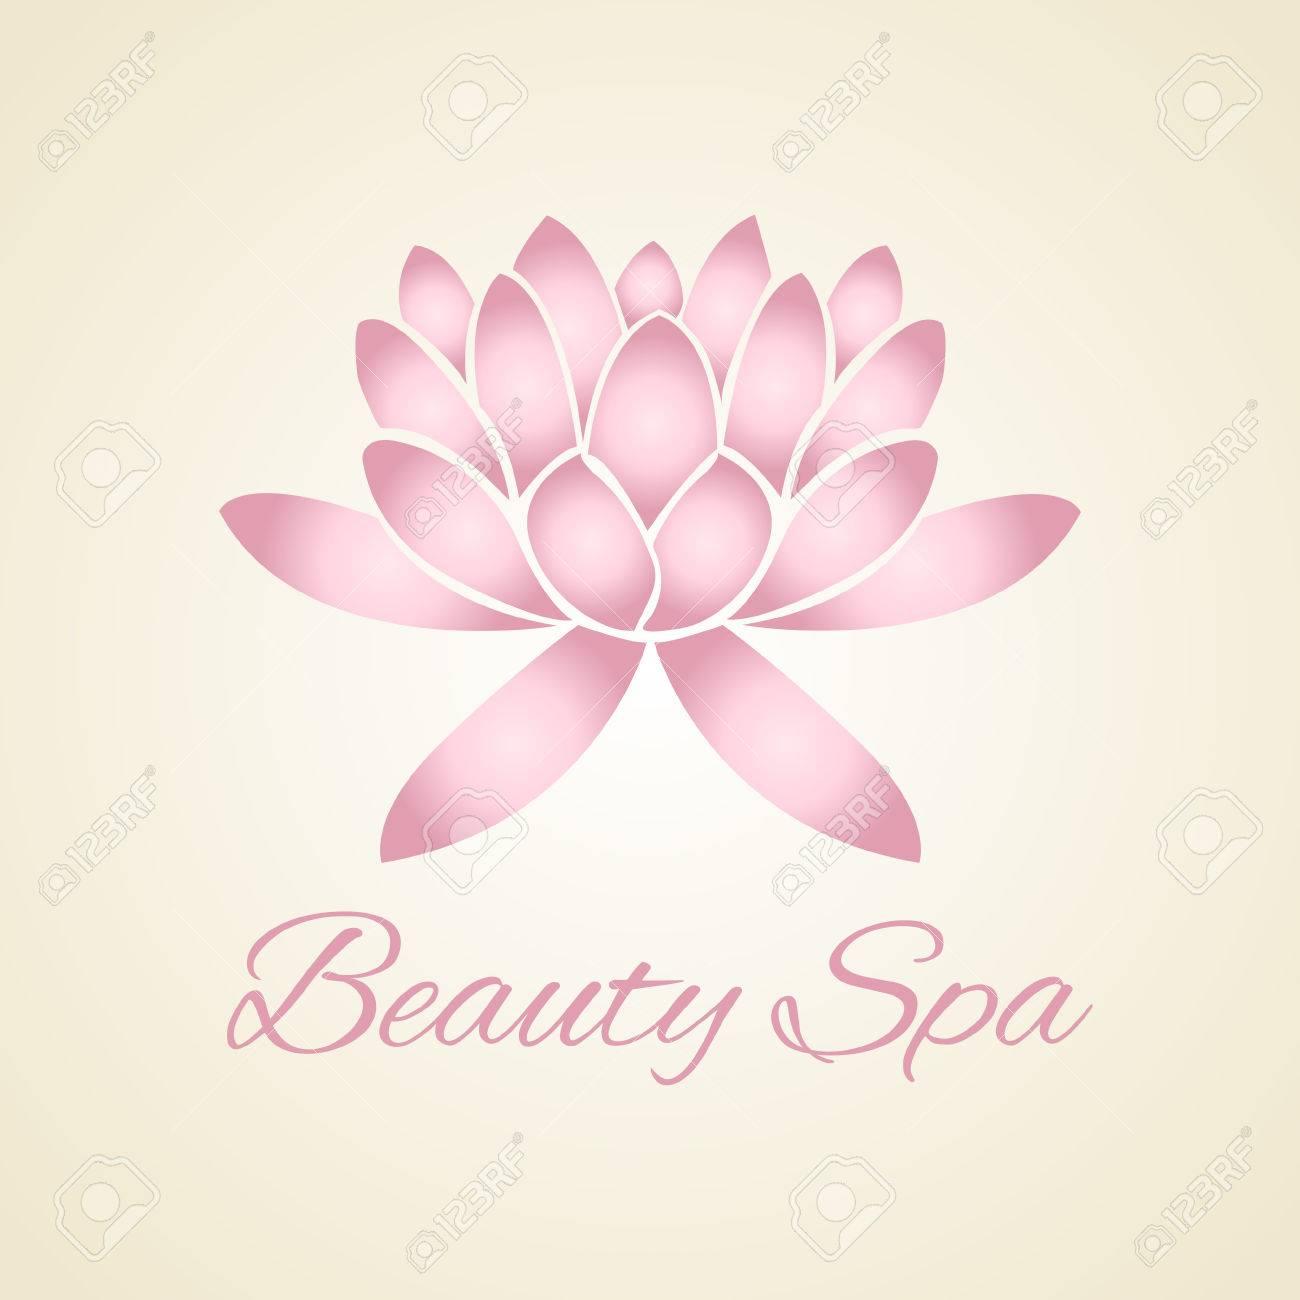 Lotus flower abstract vector logo design royalty free cliparts lotus flower abstract vector logo design stock vector 39574153 mightylinksfo